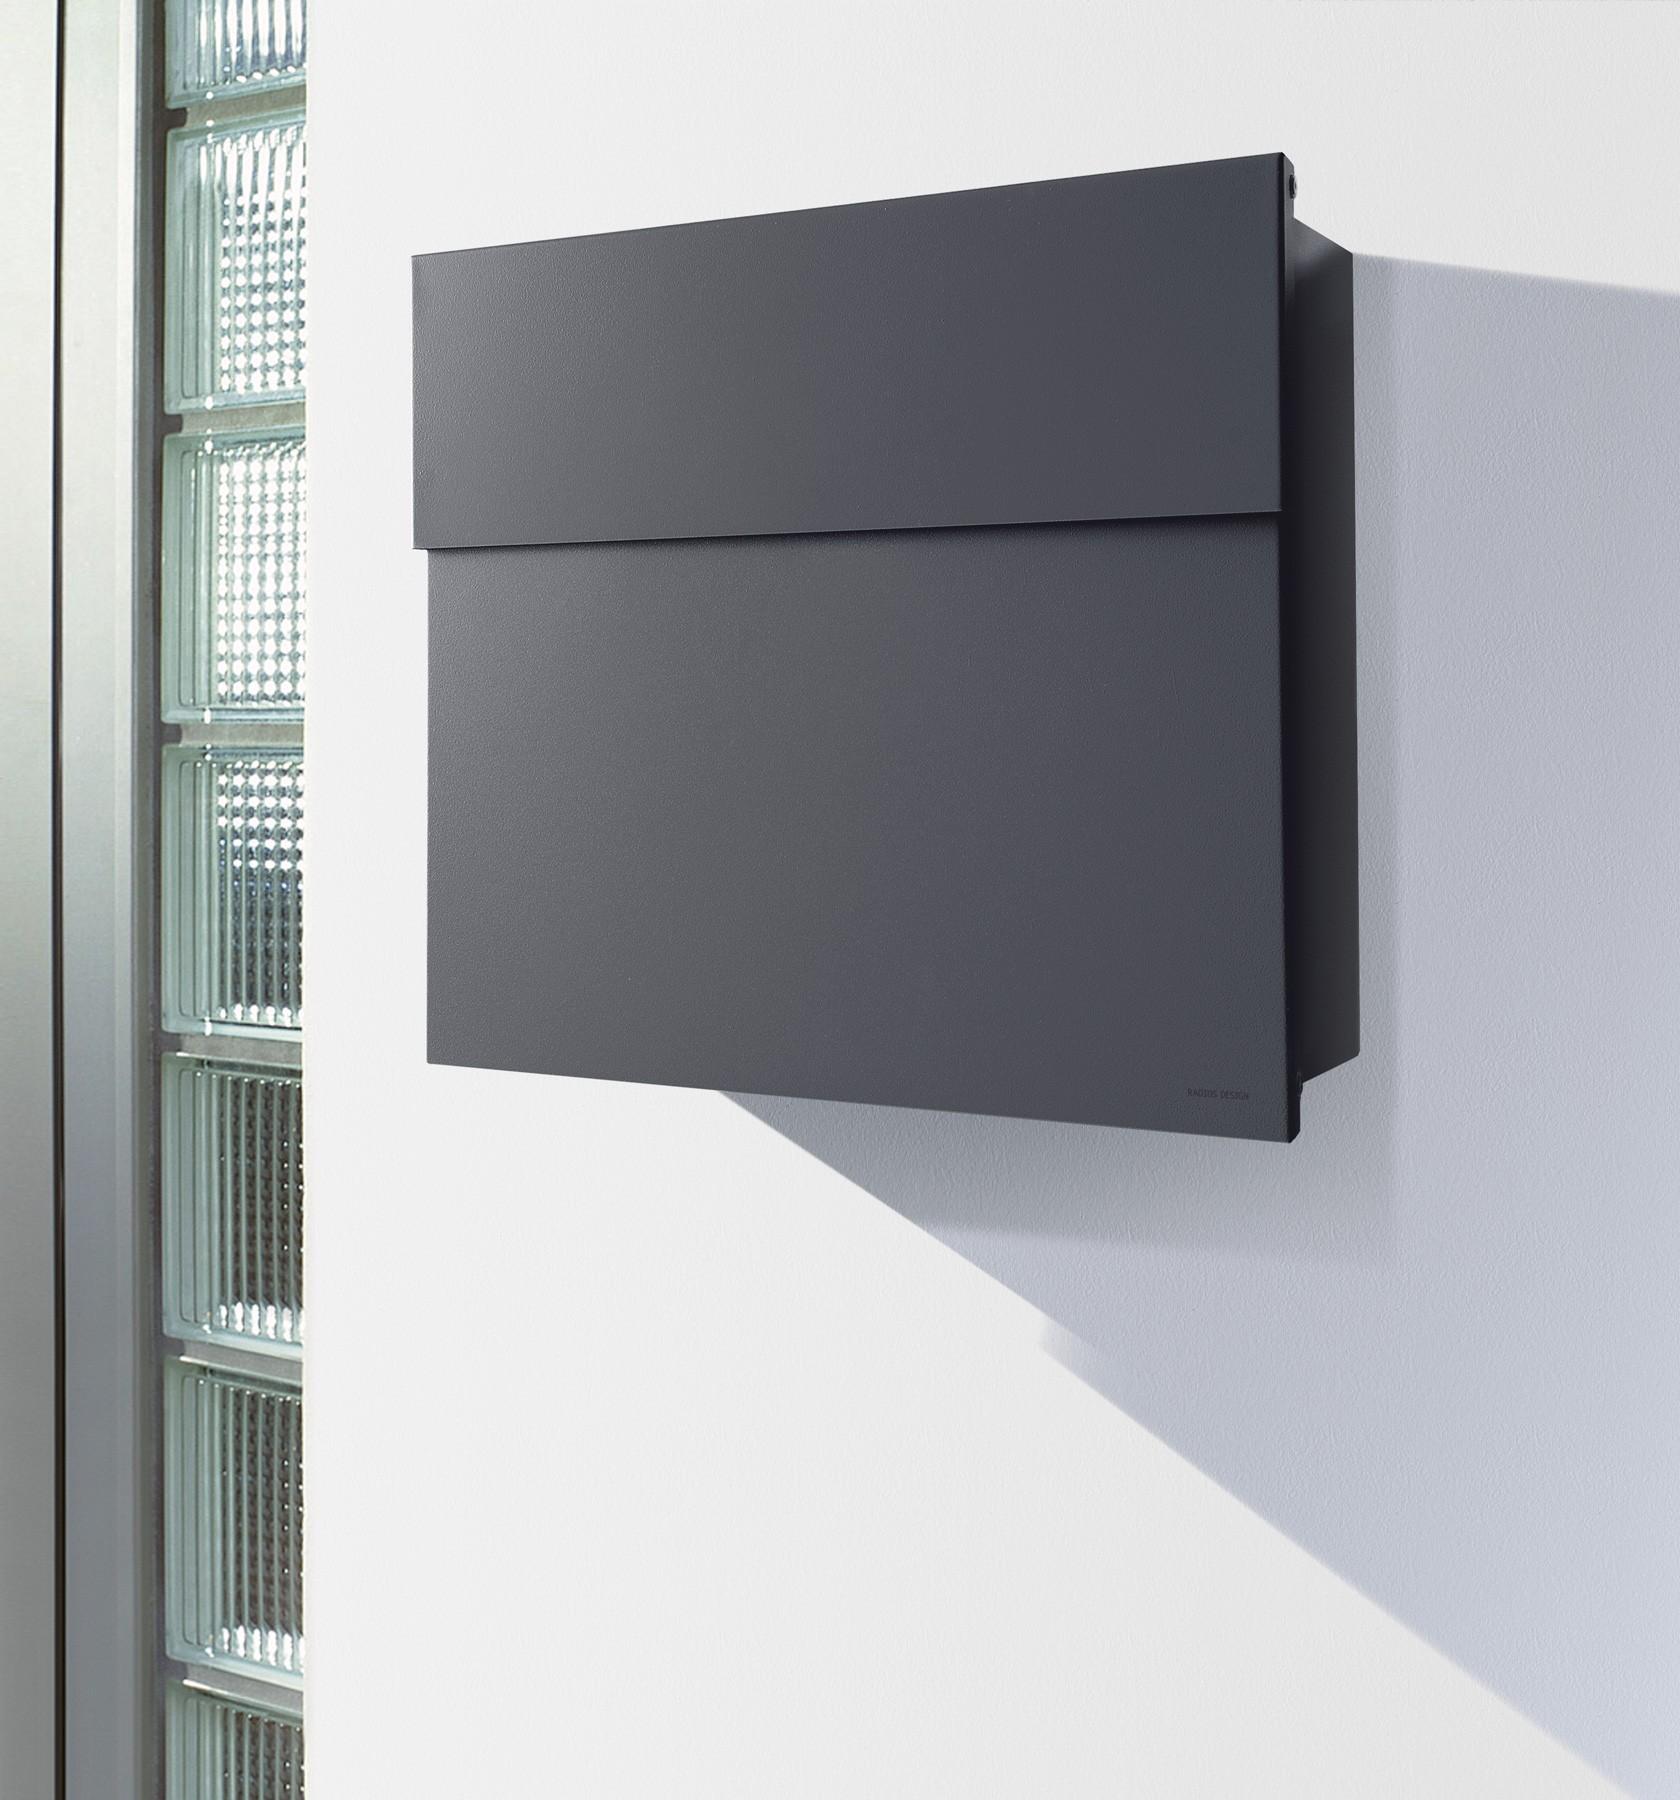 radius briefkasten letterman 4 anthrazitgrau ral 7016. Black Bedroom Furniture Sets. Home Design Ideas